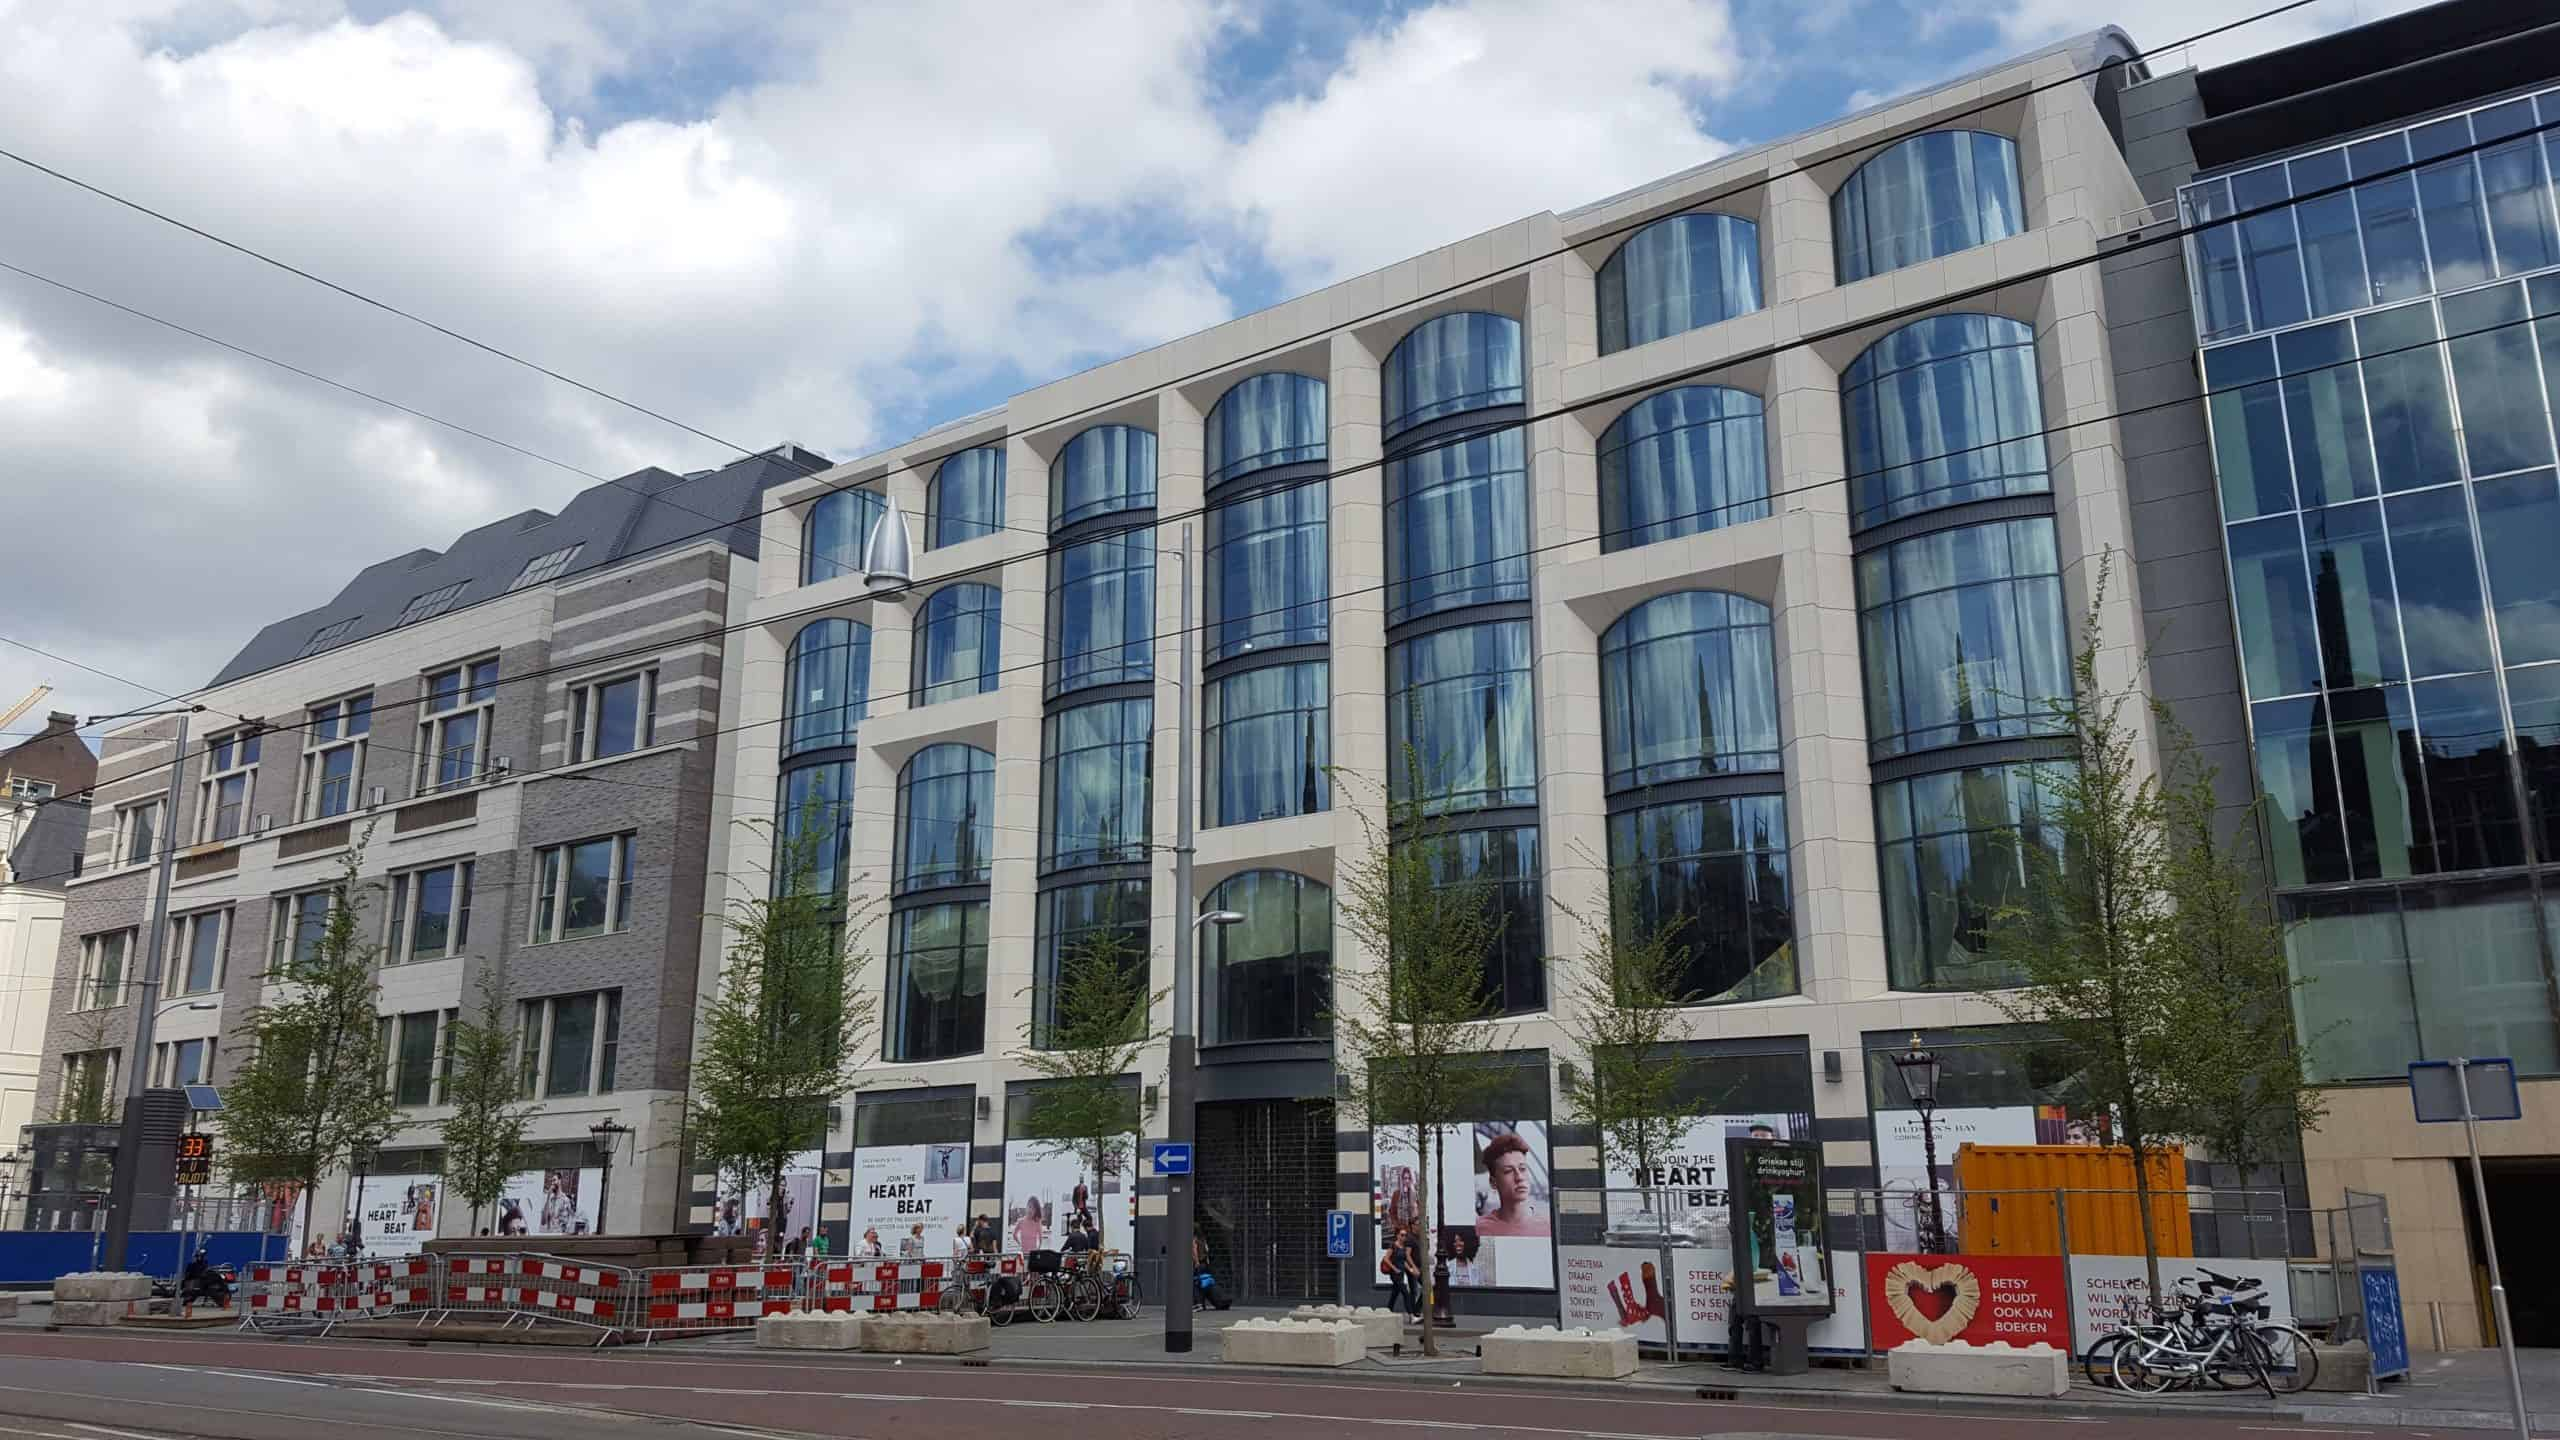 Rokin-Amsterdam-juni-2017-3-scaled